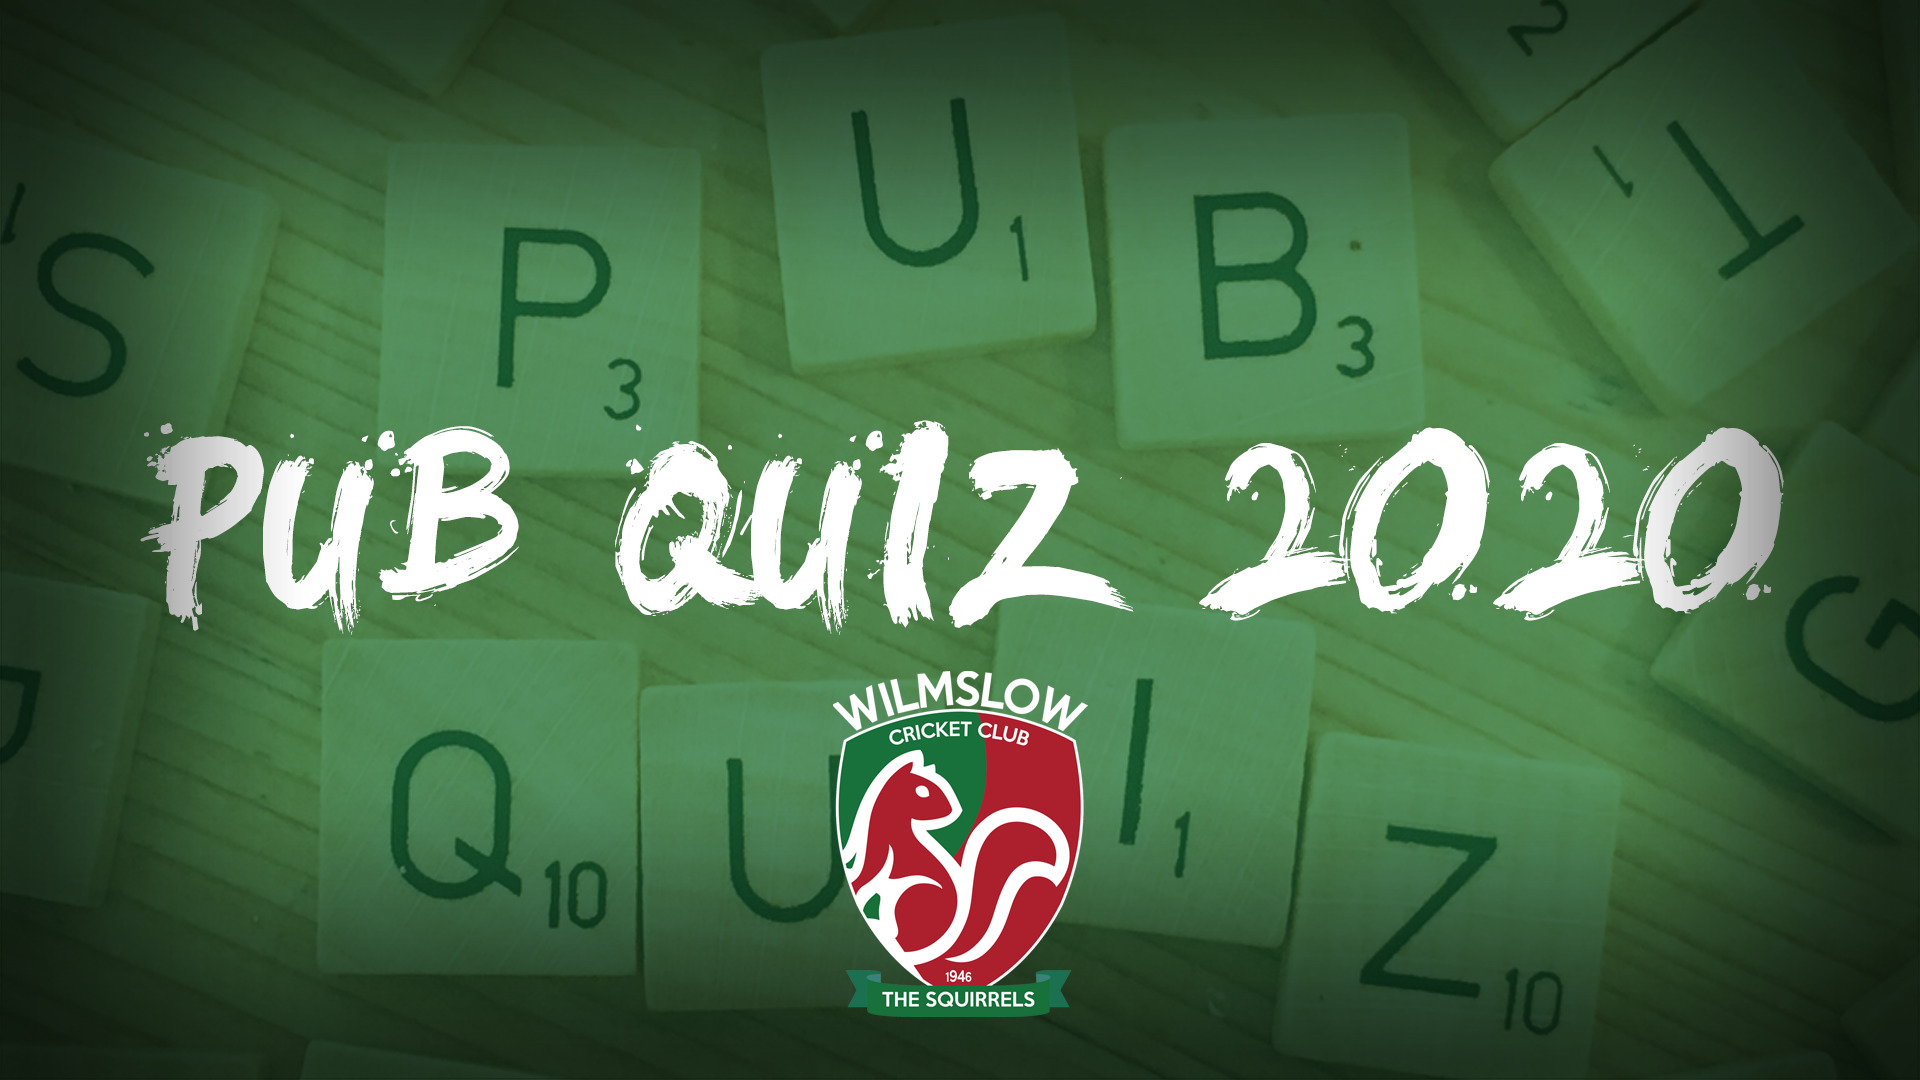 https://wilmslowcricketclub.com/wp-content/uploads/2020/03/WCC-Pub-Quiz-2020.jpg